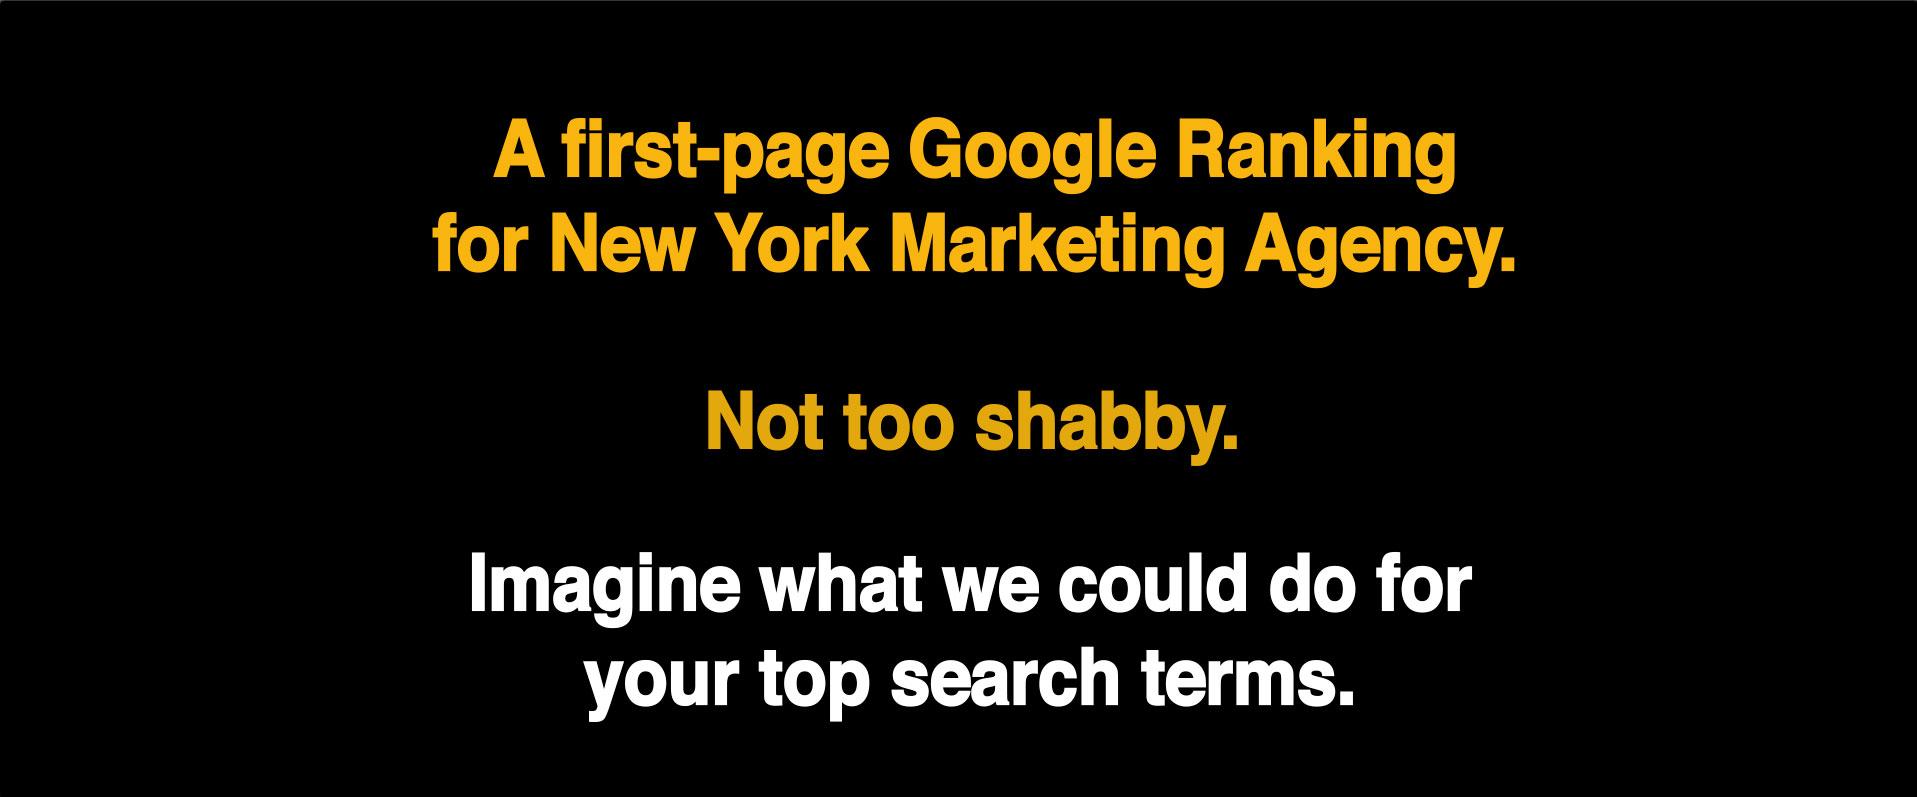 New York Marketing Agency   NYC Advertising Agency - The